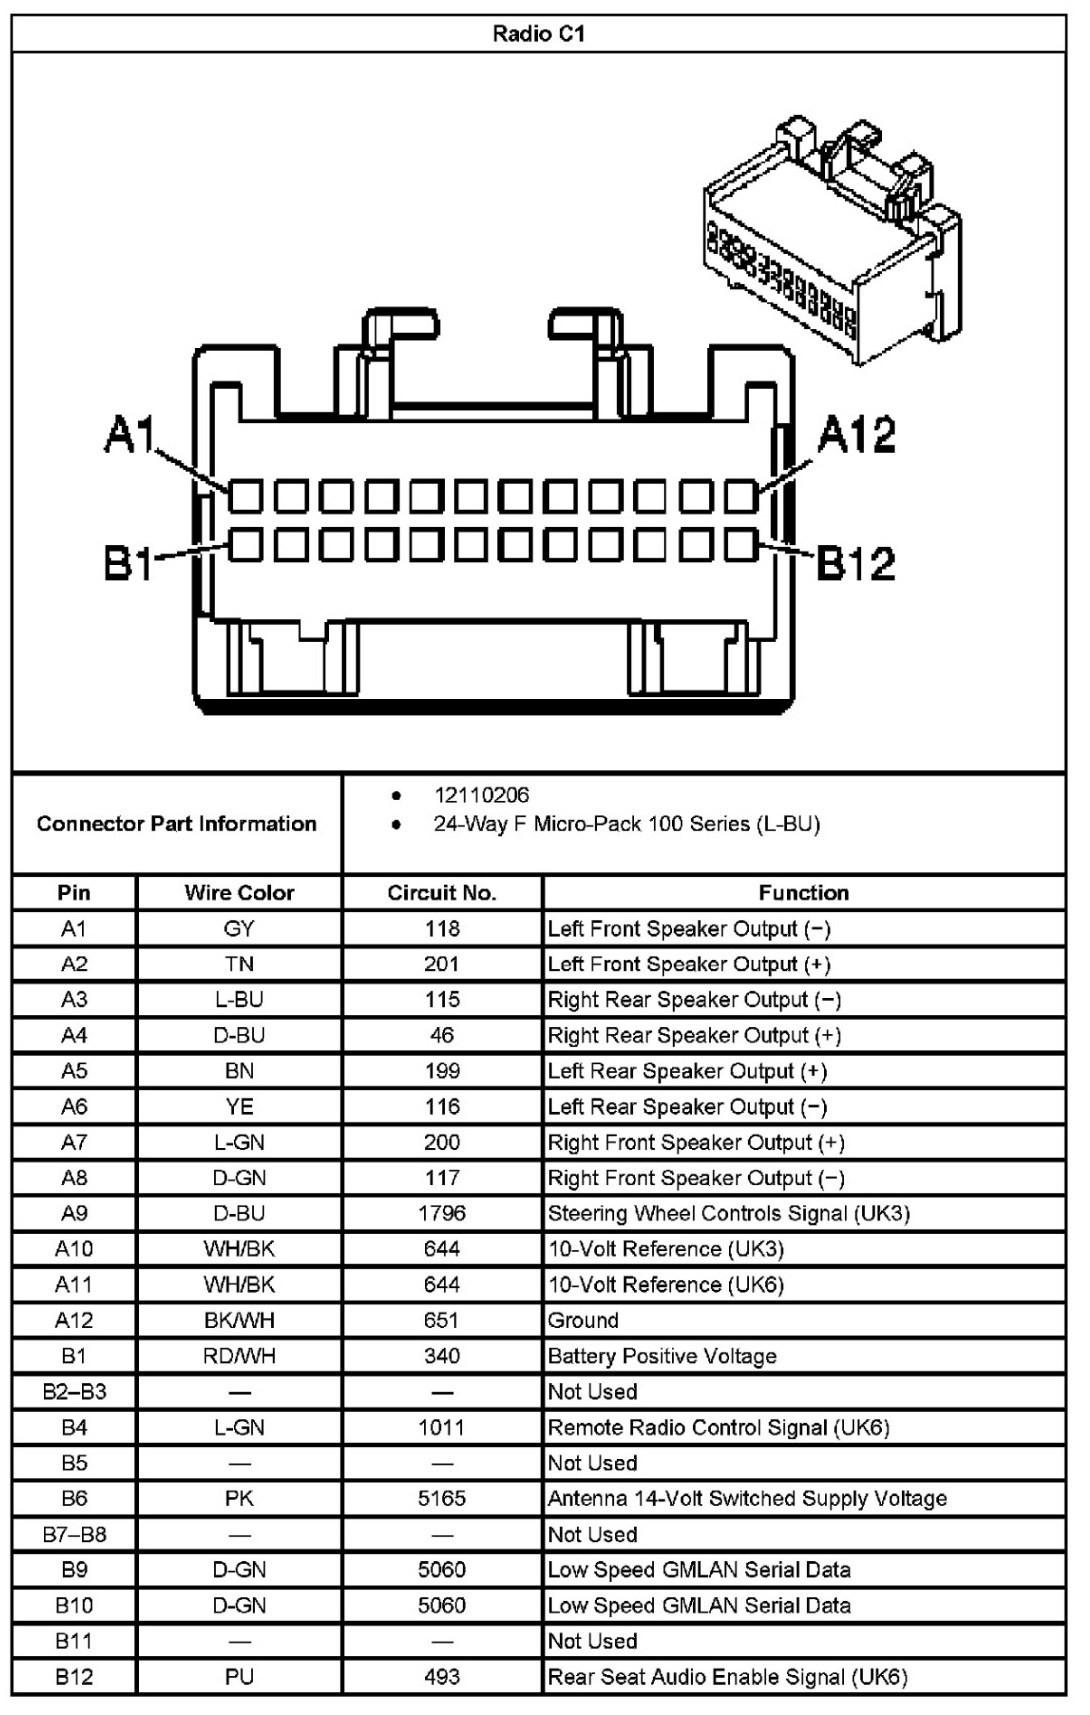 2003 Impala Radio Wiring - 2000 Honda Civic Dx Radio Wiring Diagrams for Wiring  Diagram Schematics | Wiring Diagram For 2003 Chevy Impala |  | Wiring Diagram Schematics